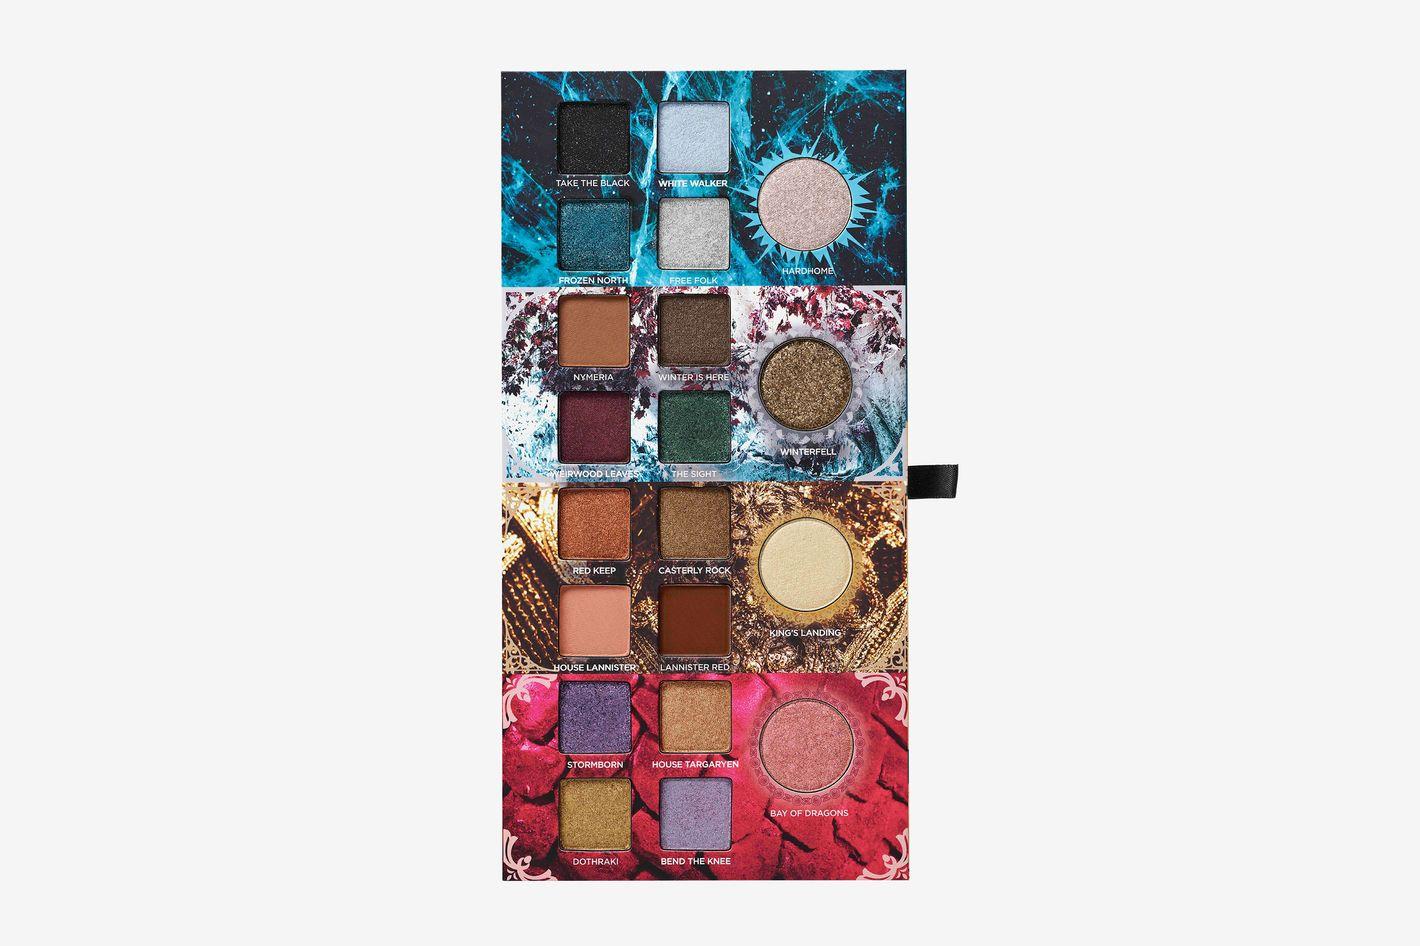 Game of Thrones Eyeshadow Palette